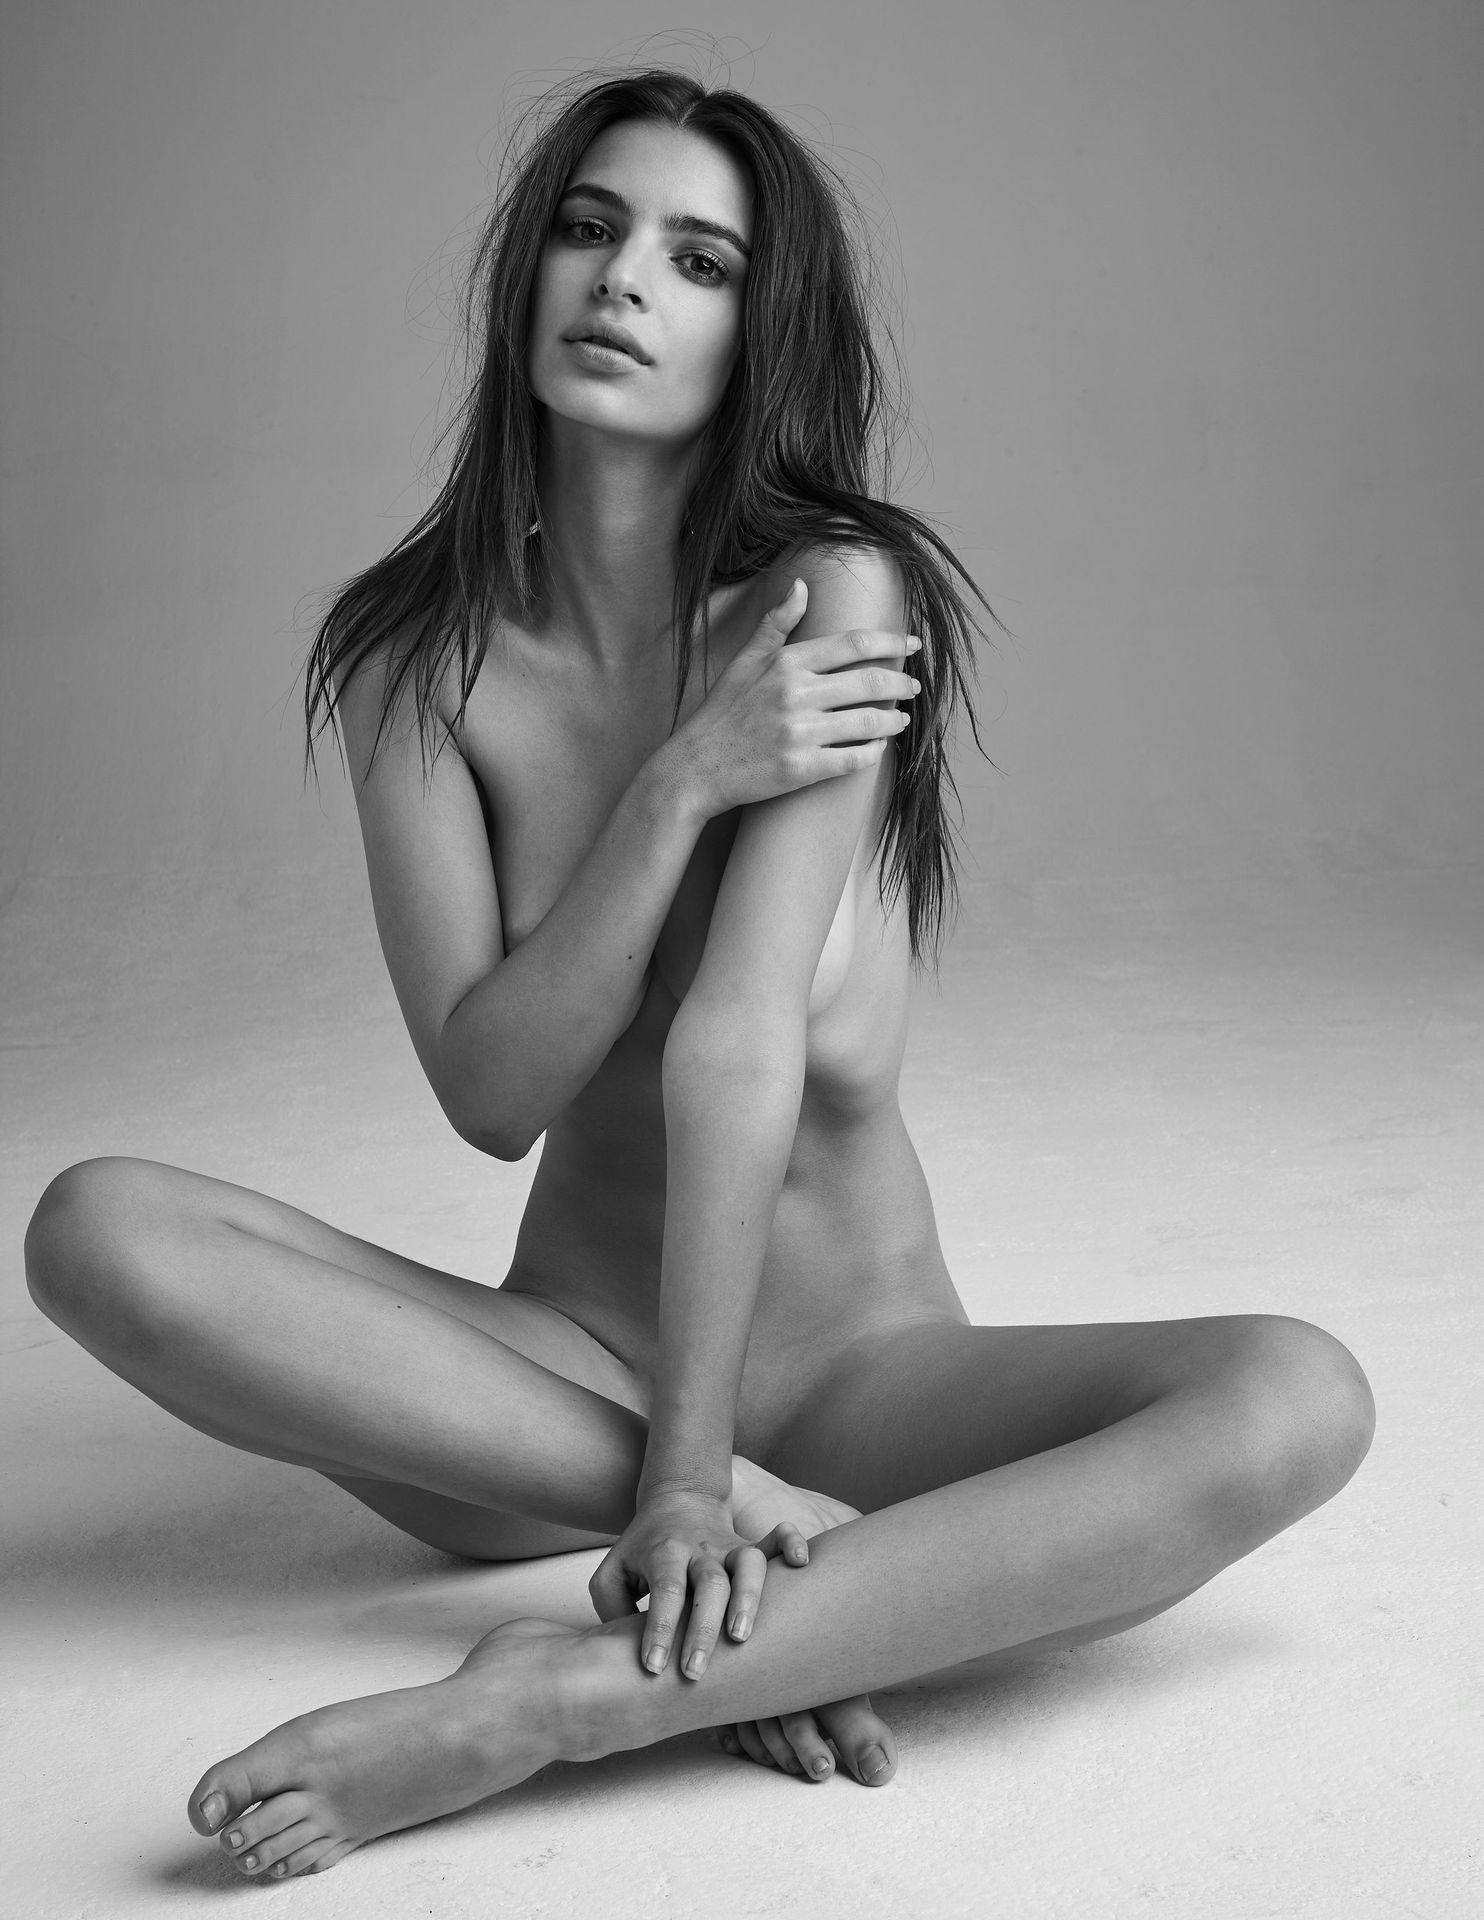 Emily-Ratajkowski-Nude-23-thefappeningblog.com_.jpg